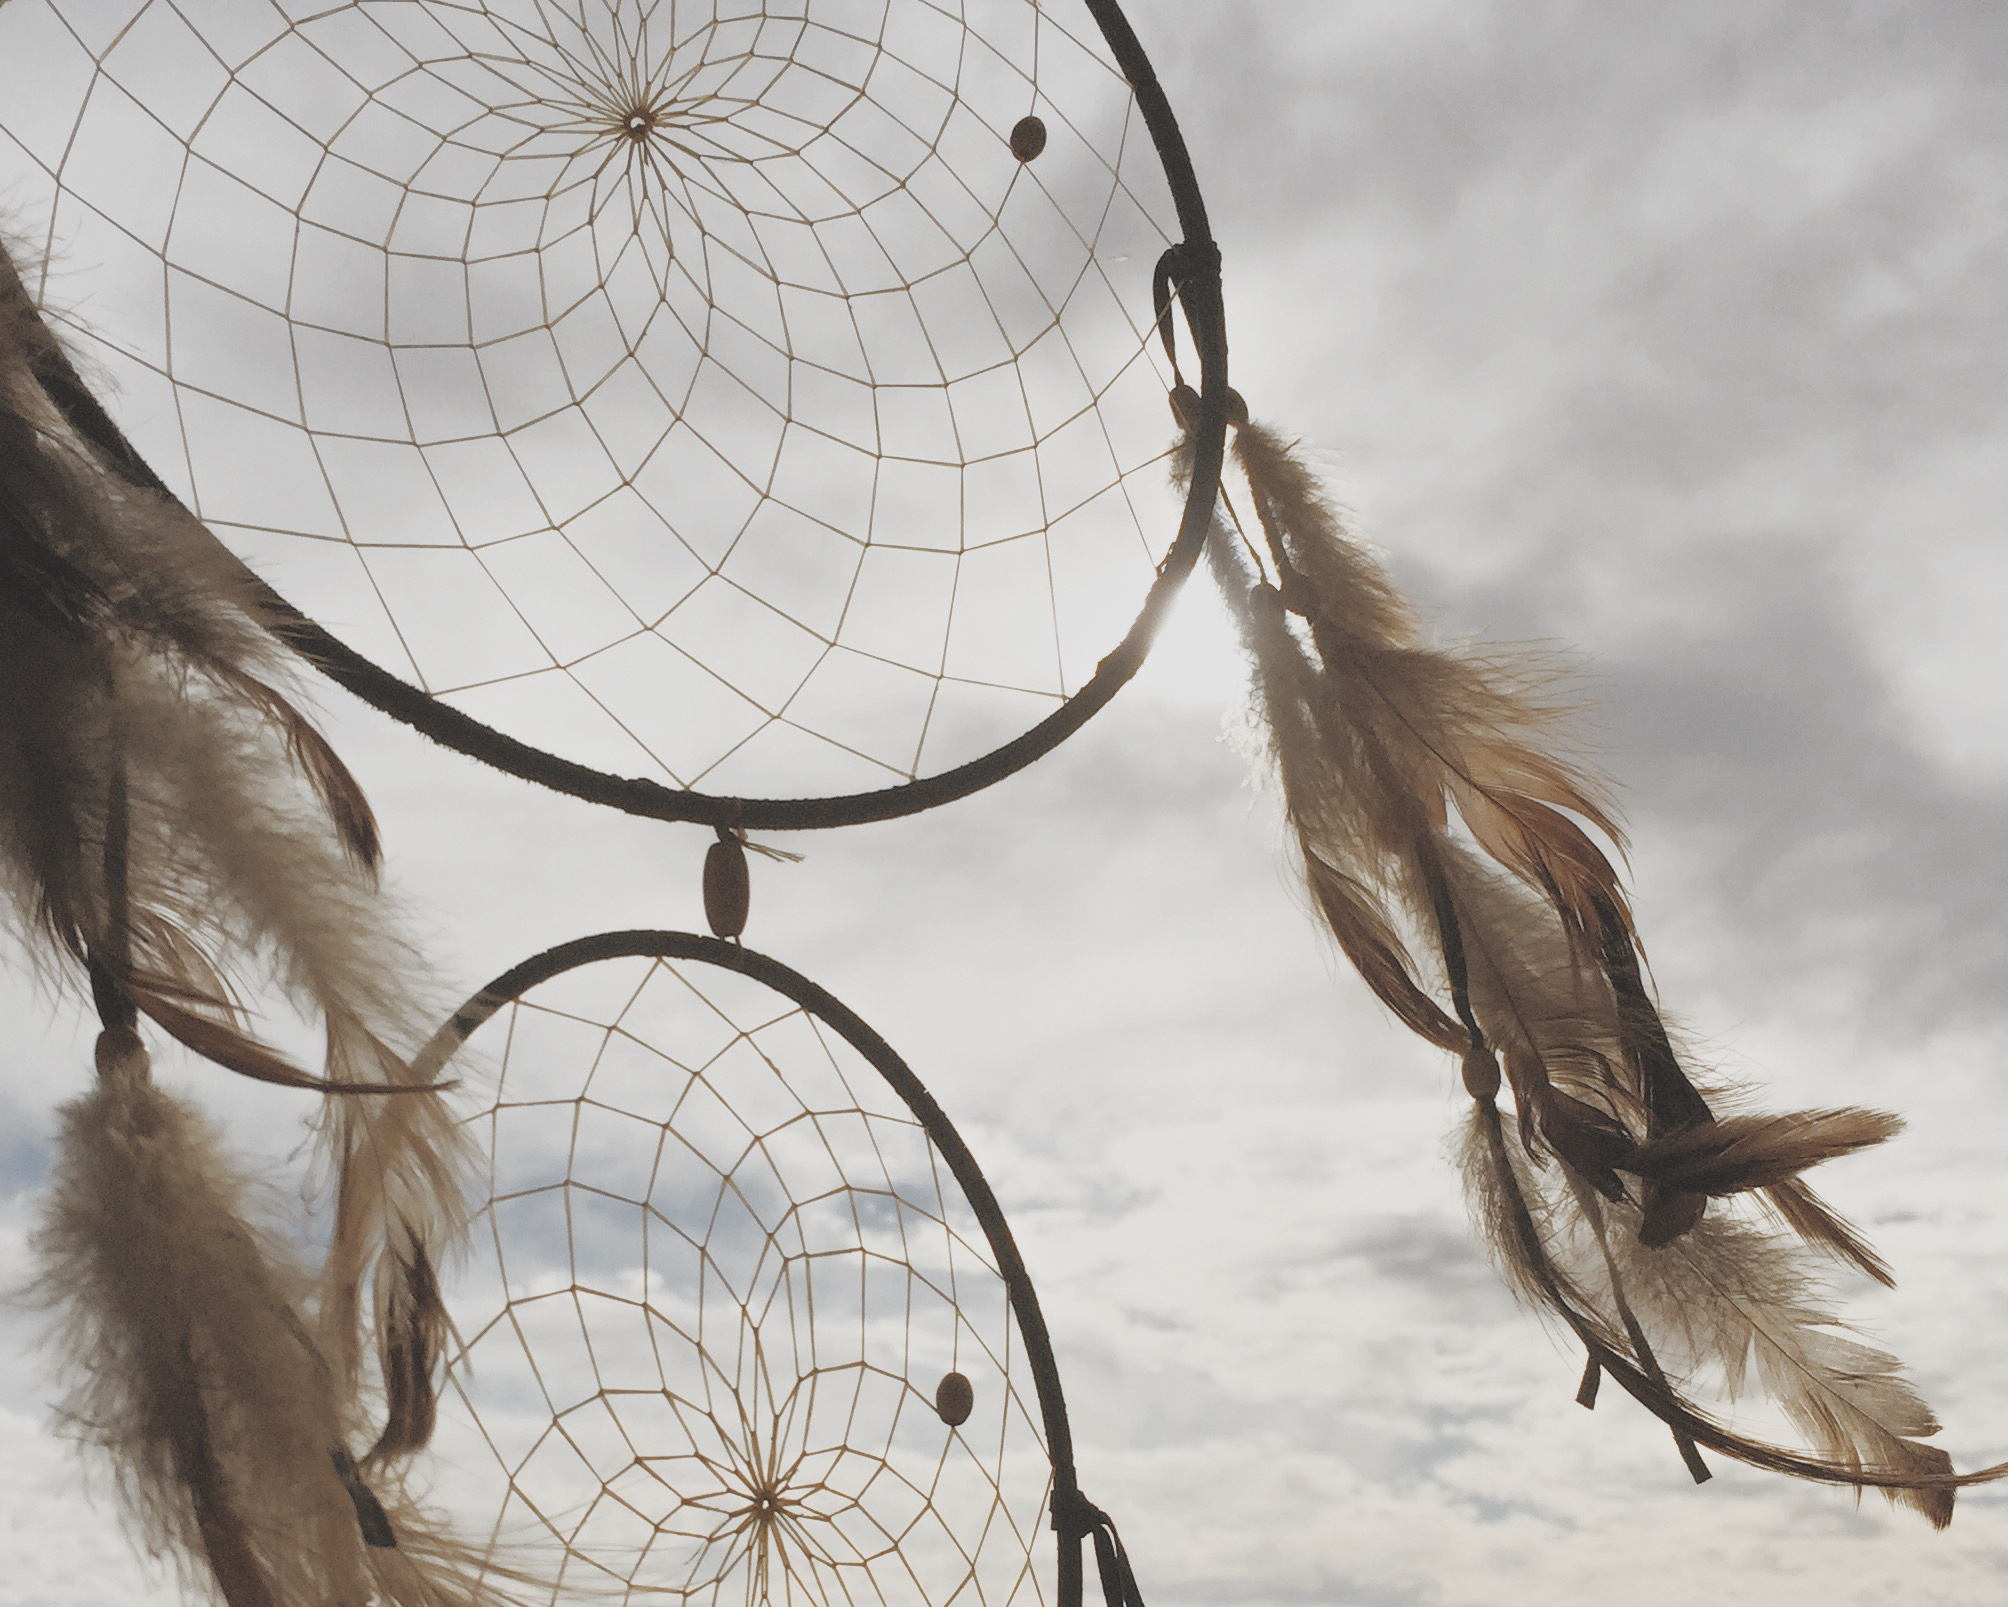 Julie Cimpko   -  Imagine  that all of your dreams can come true. (Dreamcatcher photo taken in Laguna Beach, CA)